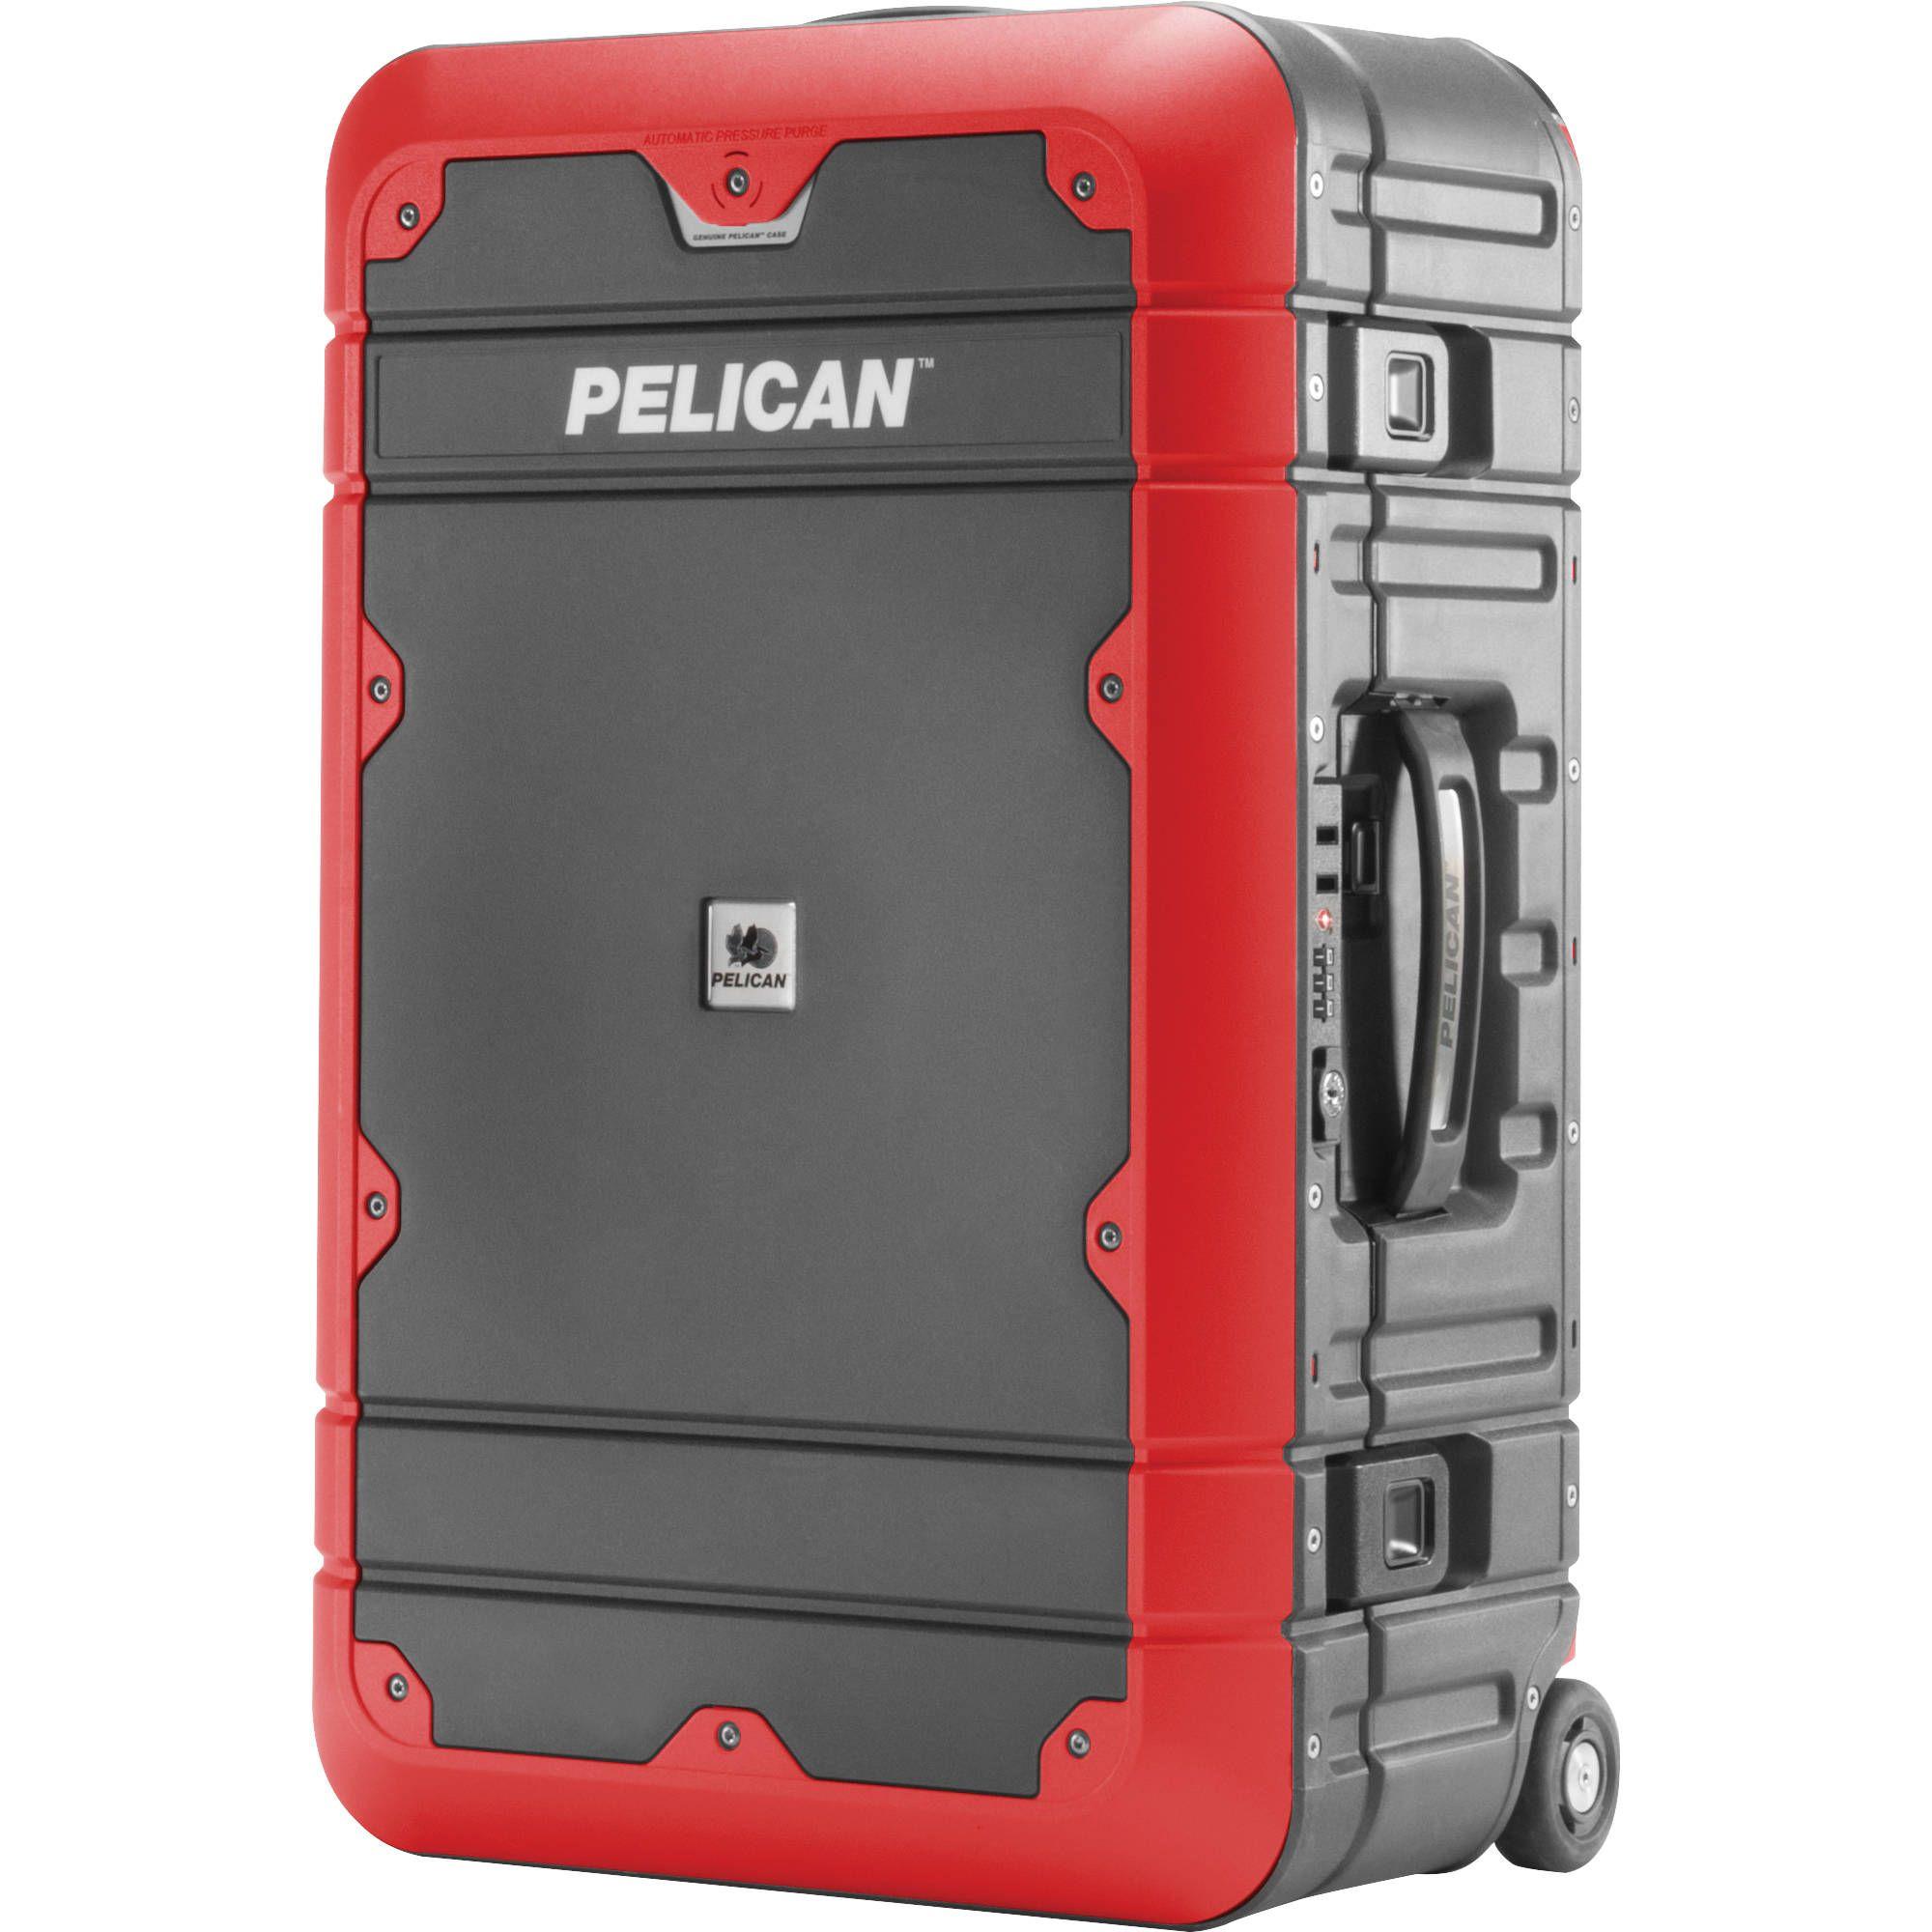 Pelican Ba22 Elite Carry On Luggage Lg Ba22 Gryred B H Photo Luggage Pelican Carry On Luggage